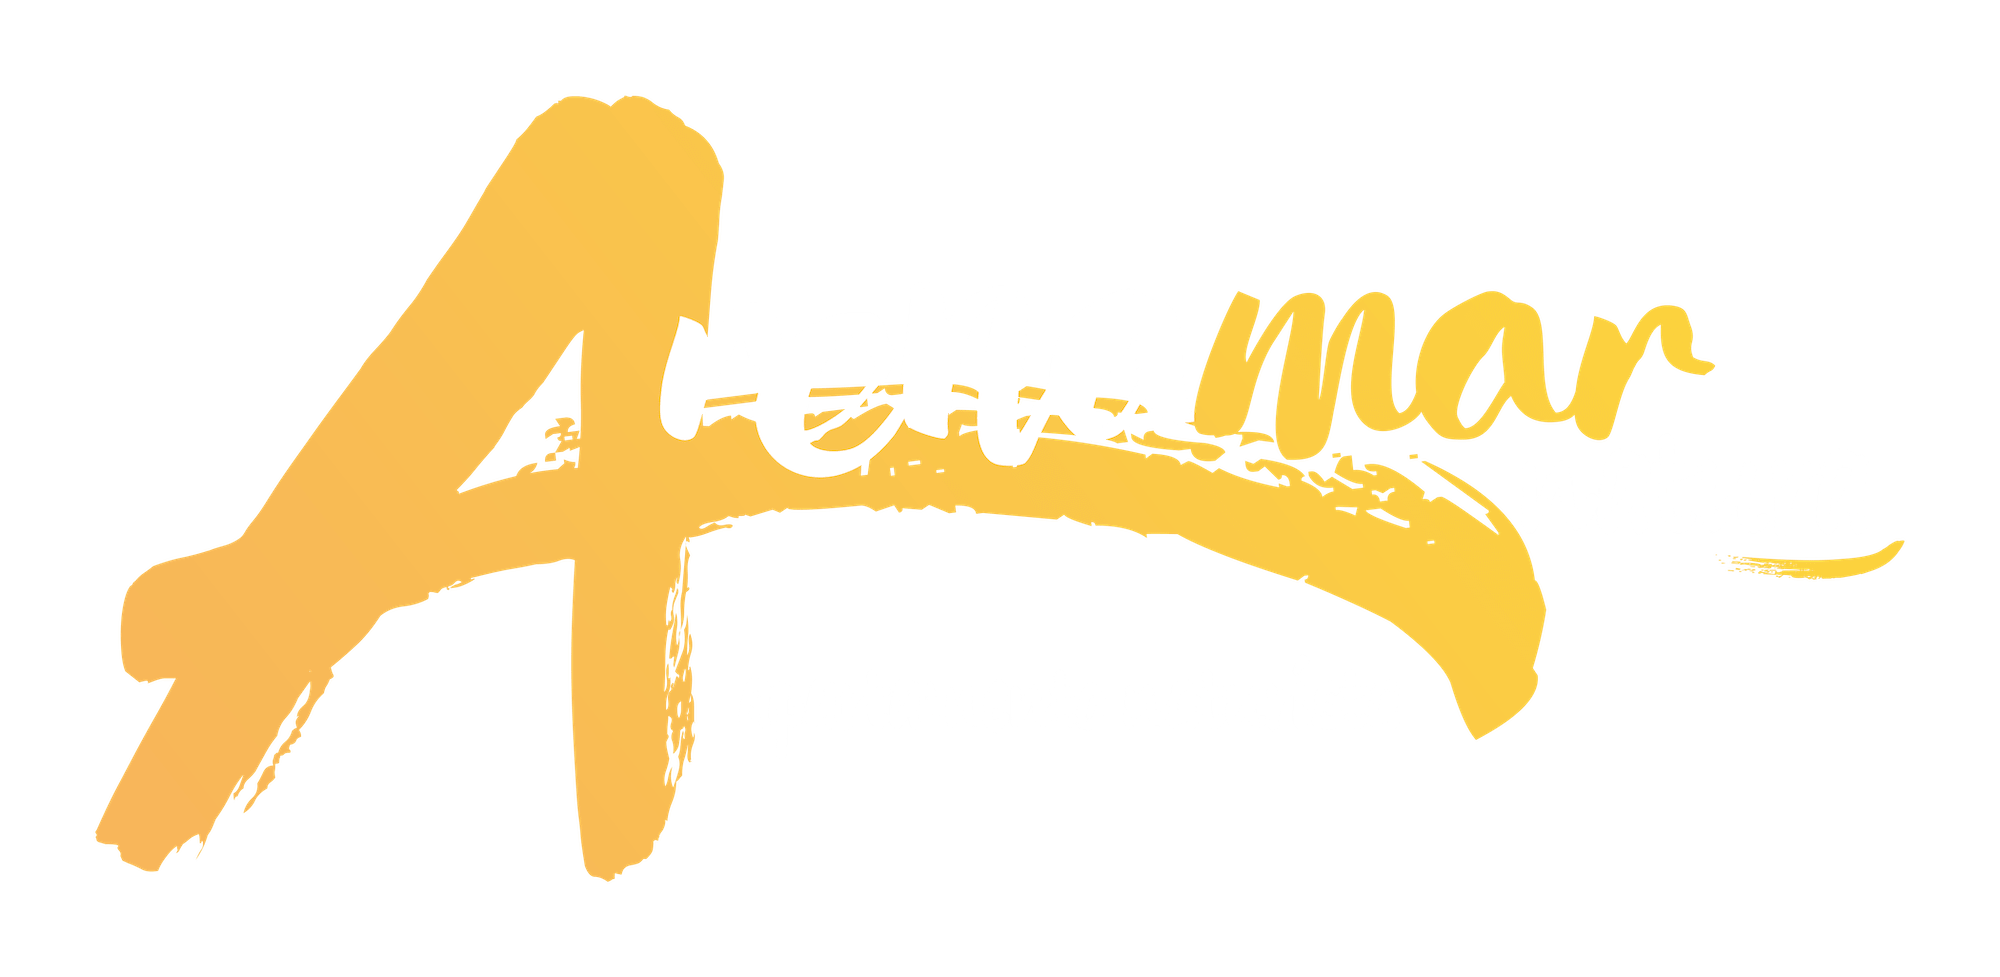 Arenamar Natura | Apartamento naturista